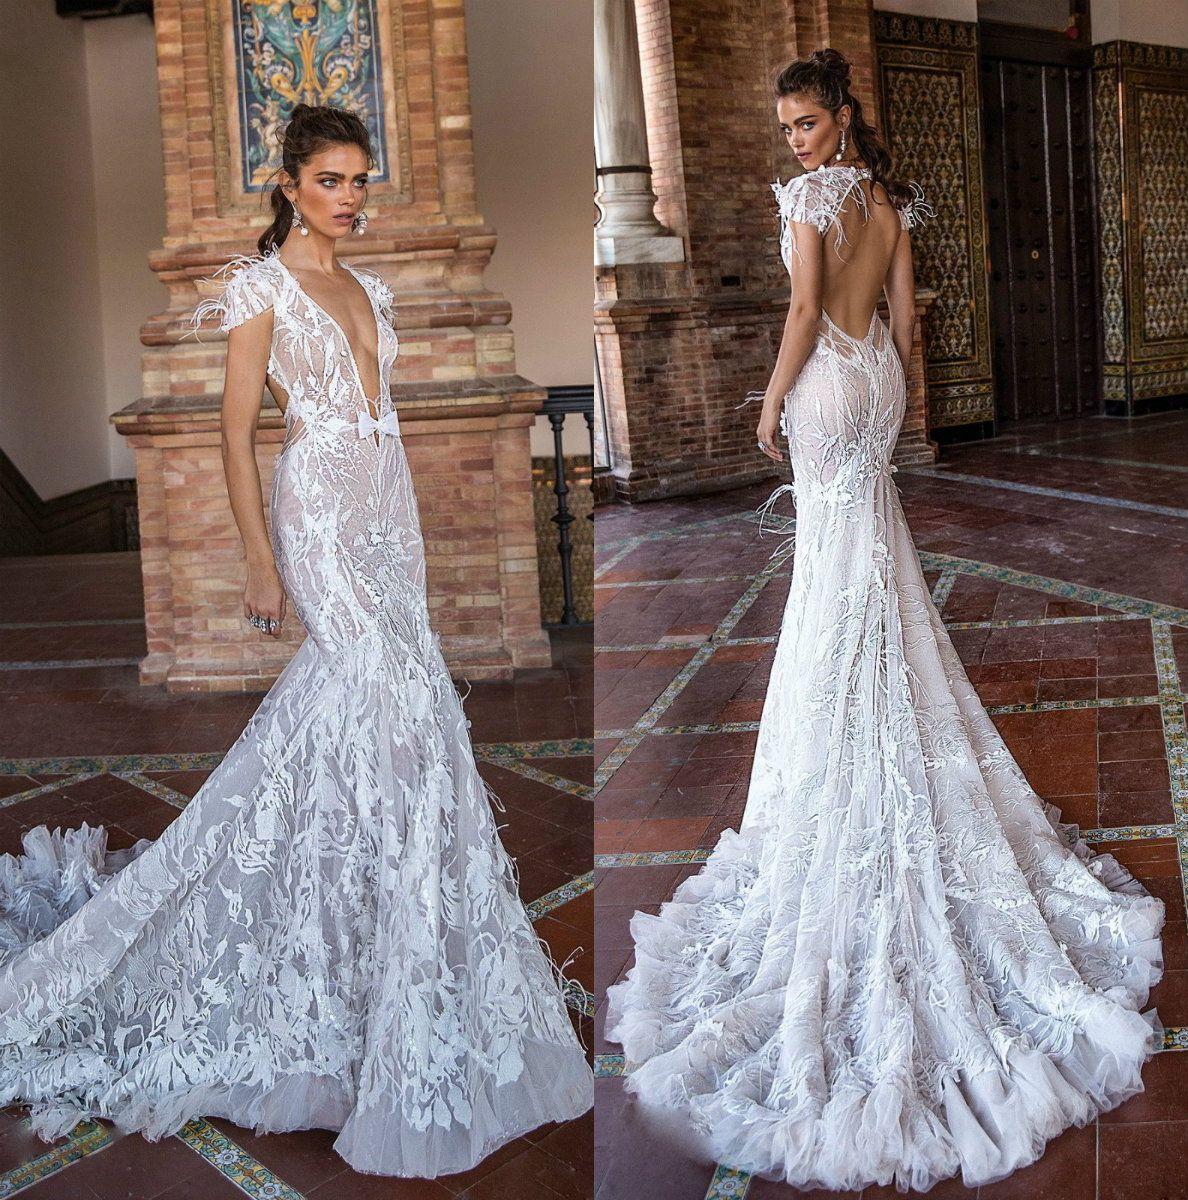 Berta 2019 Mermaid Wedding Dresses V Neck Backless Lace